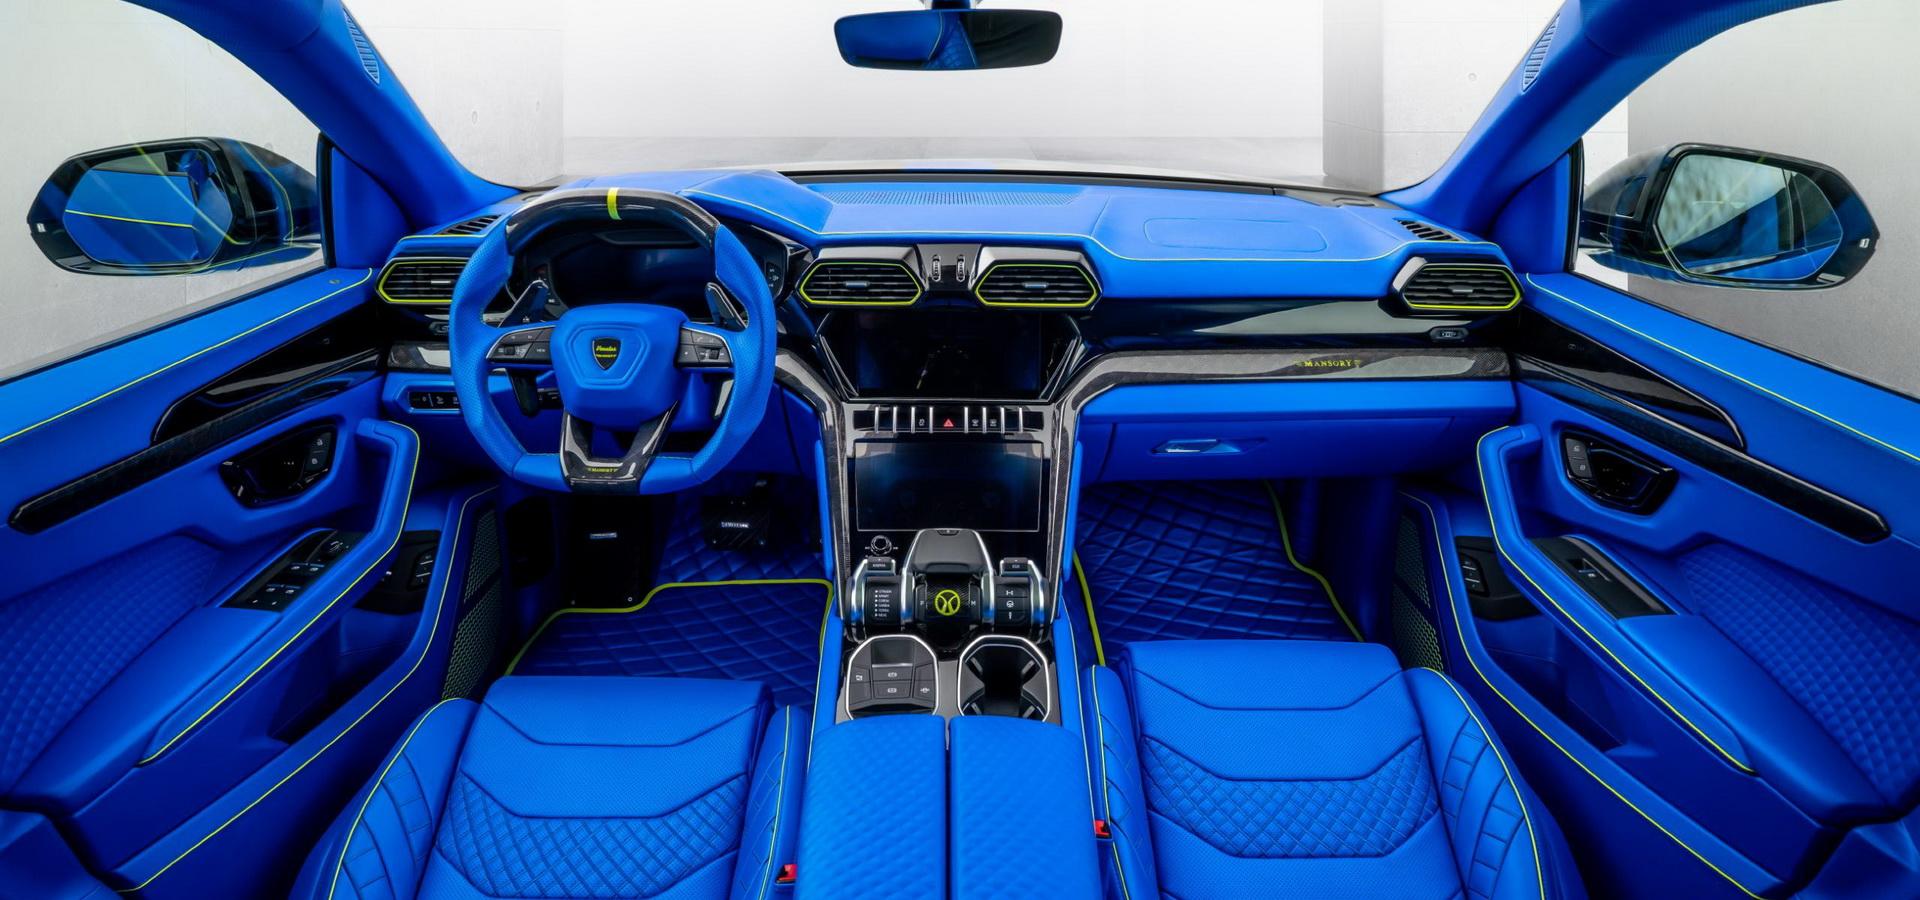 Самый невероятный тюнинг Lamborghini Urus от Mansory